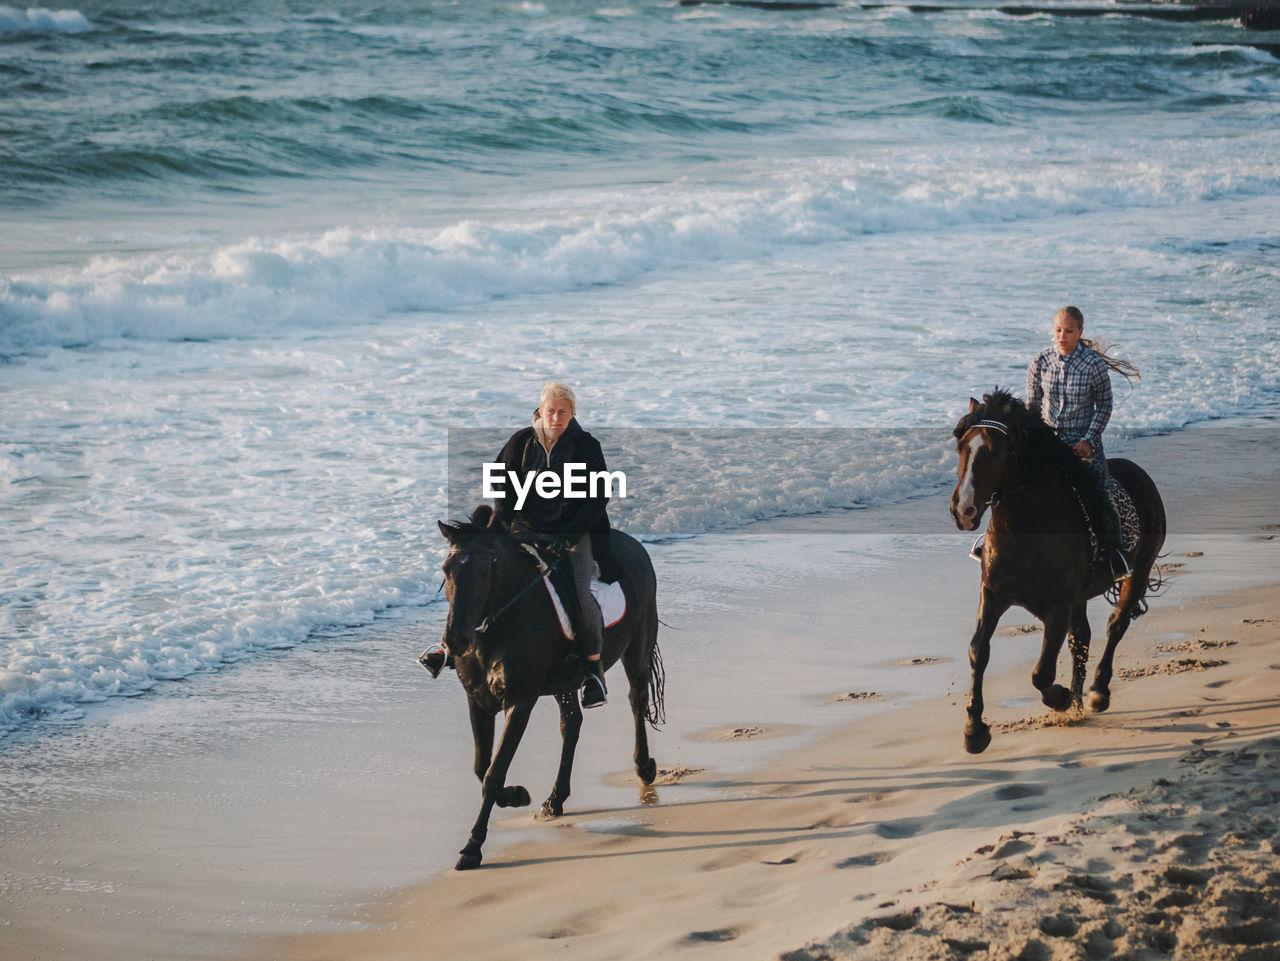 Friends horseback riding on shore at beach